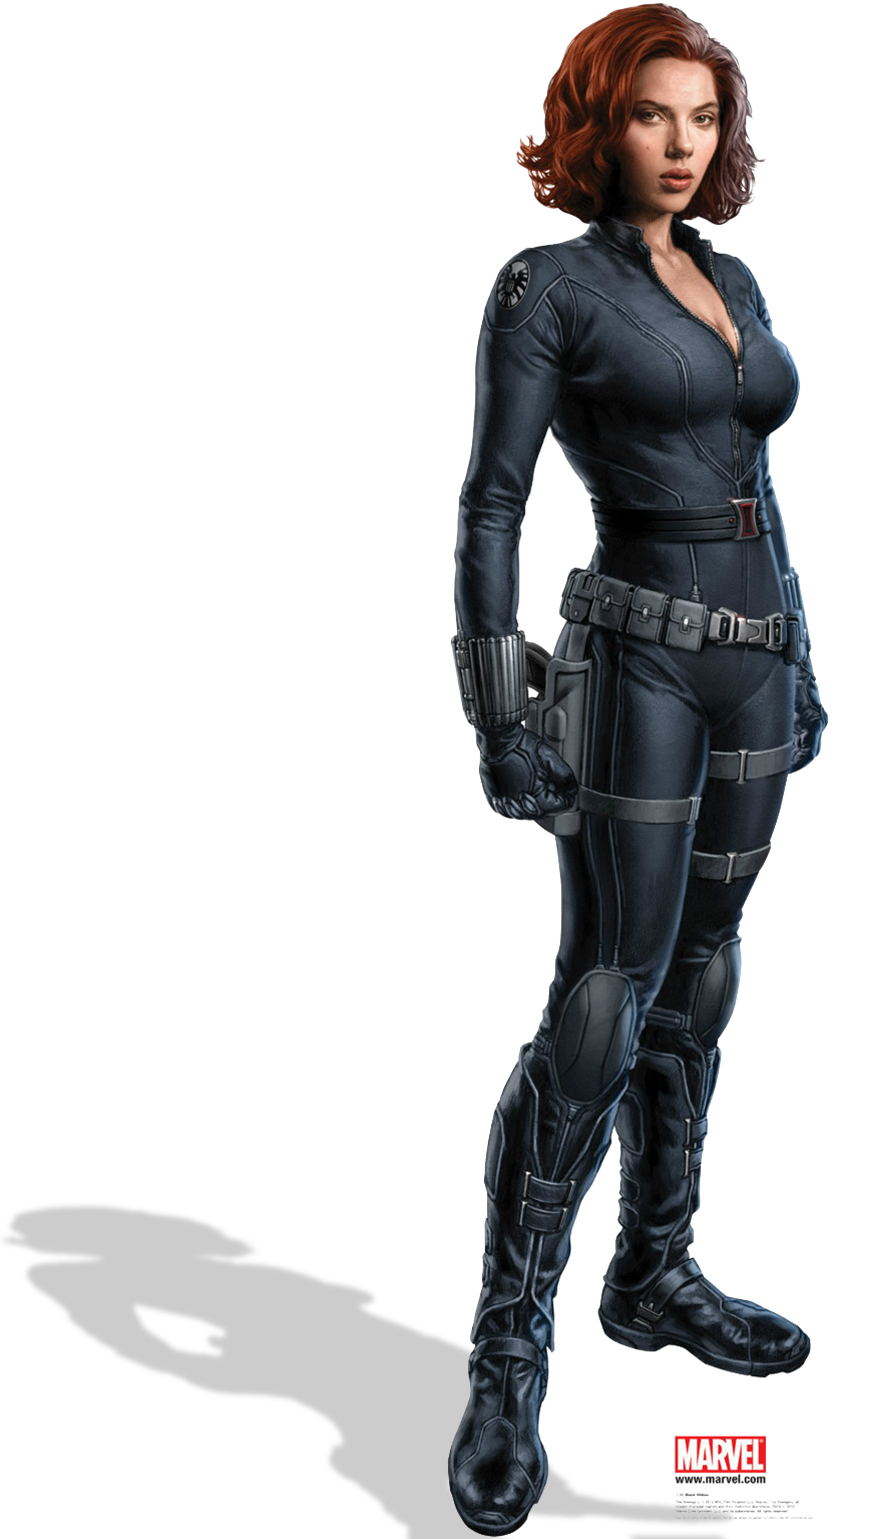 Download Black Widow Png Image HQ PNG Image   FreePNGImg